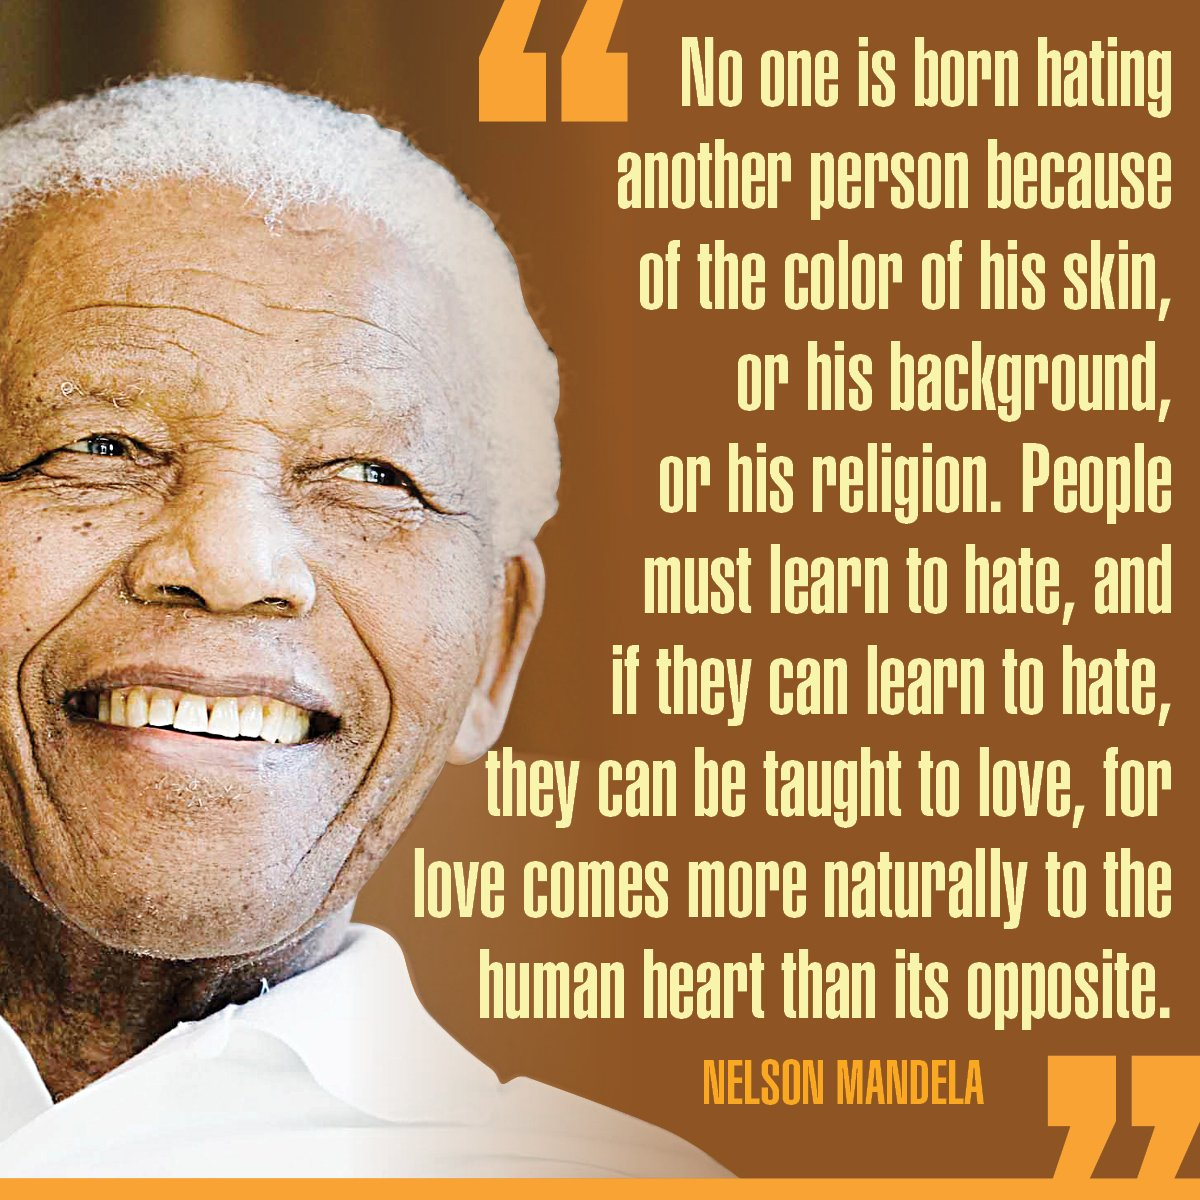 Happy 100th birthday, Nelson Mandela!   Remember the anti-apartheid hero's life in photos: https://t.co/9zu2fxfZyq https://t.co/zO2YlW5vo3